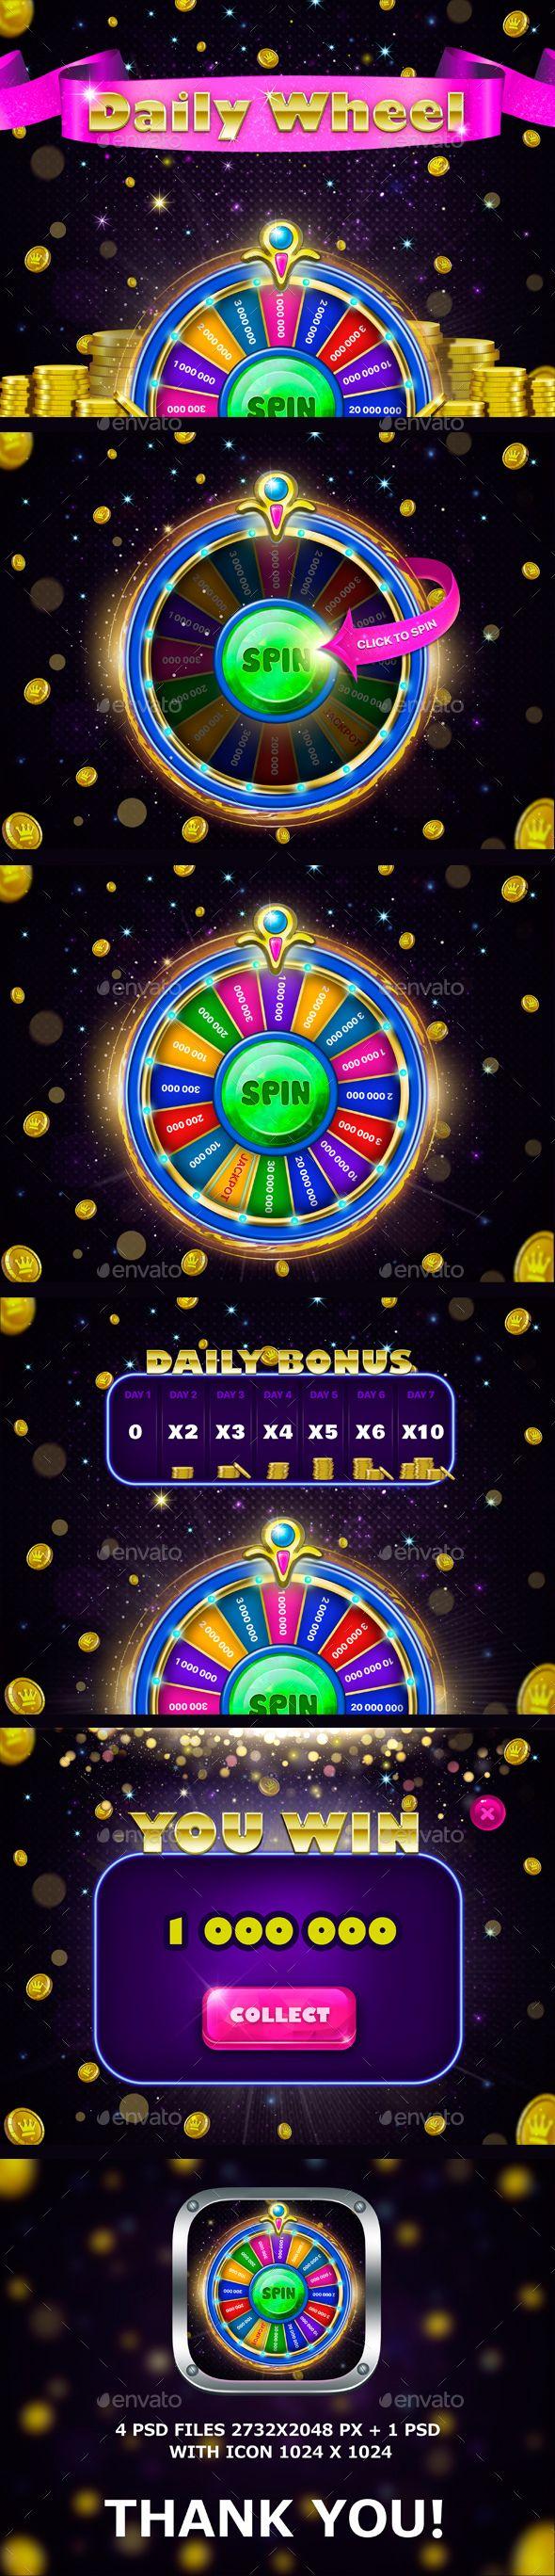 Casino Daily Wheel Set Download here: https://graphicriver.net/item/casino-daily-wheel-set/18458054?ref=KlitVogli